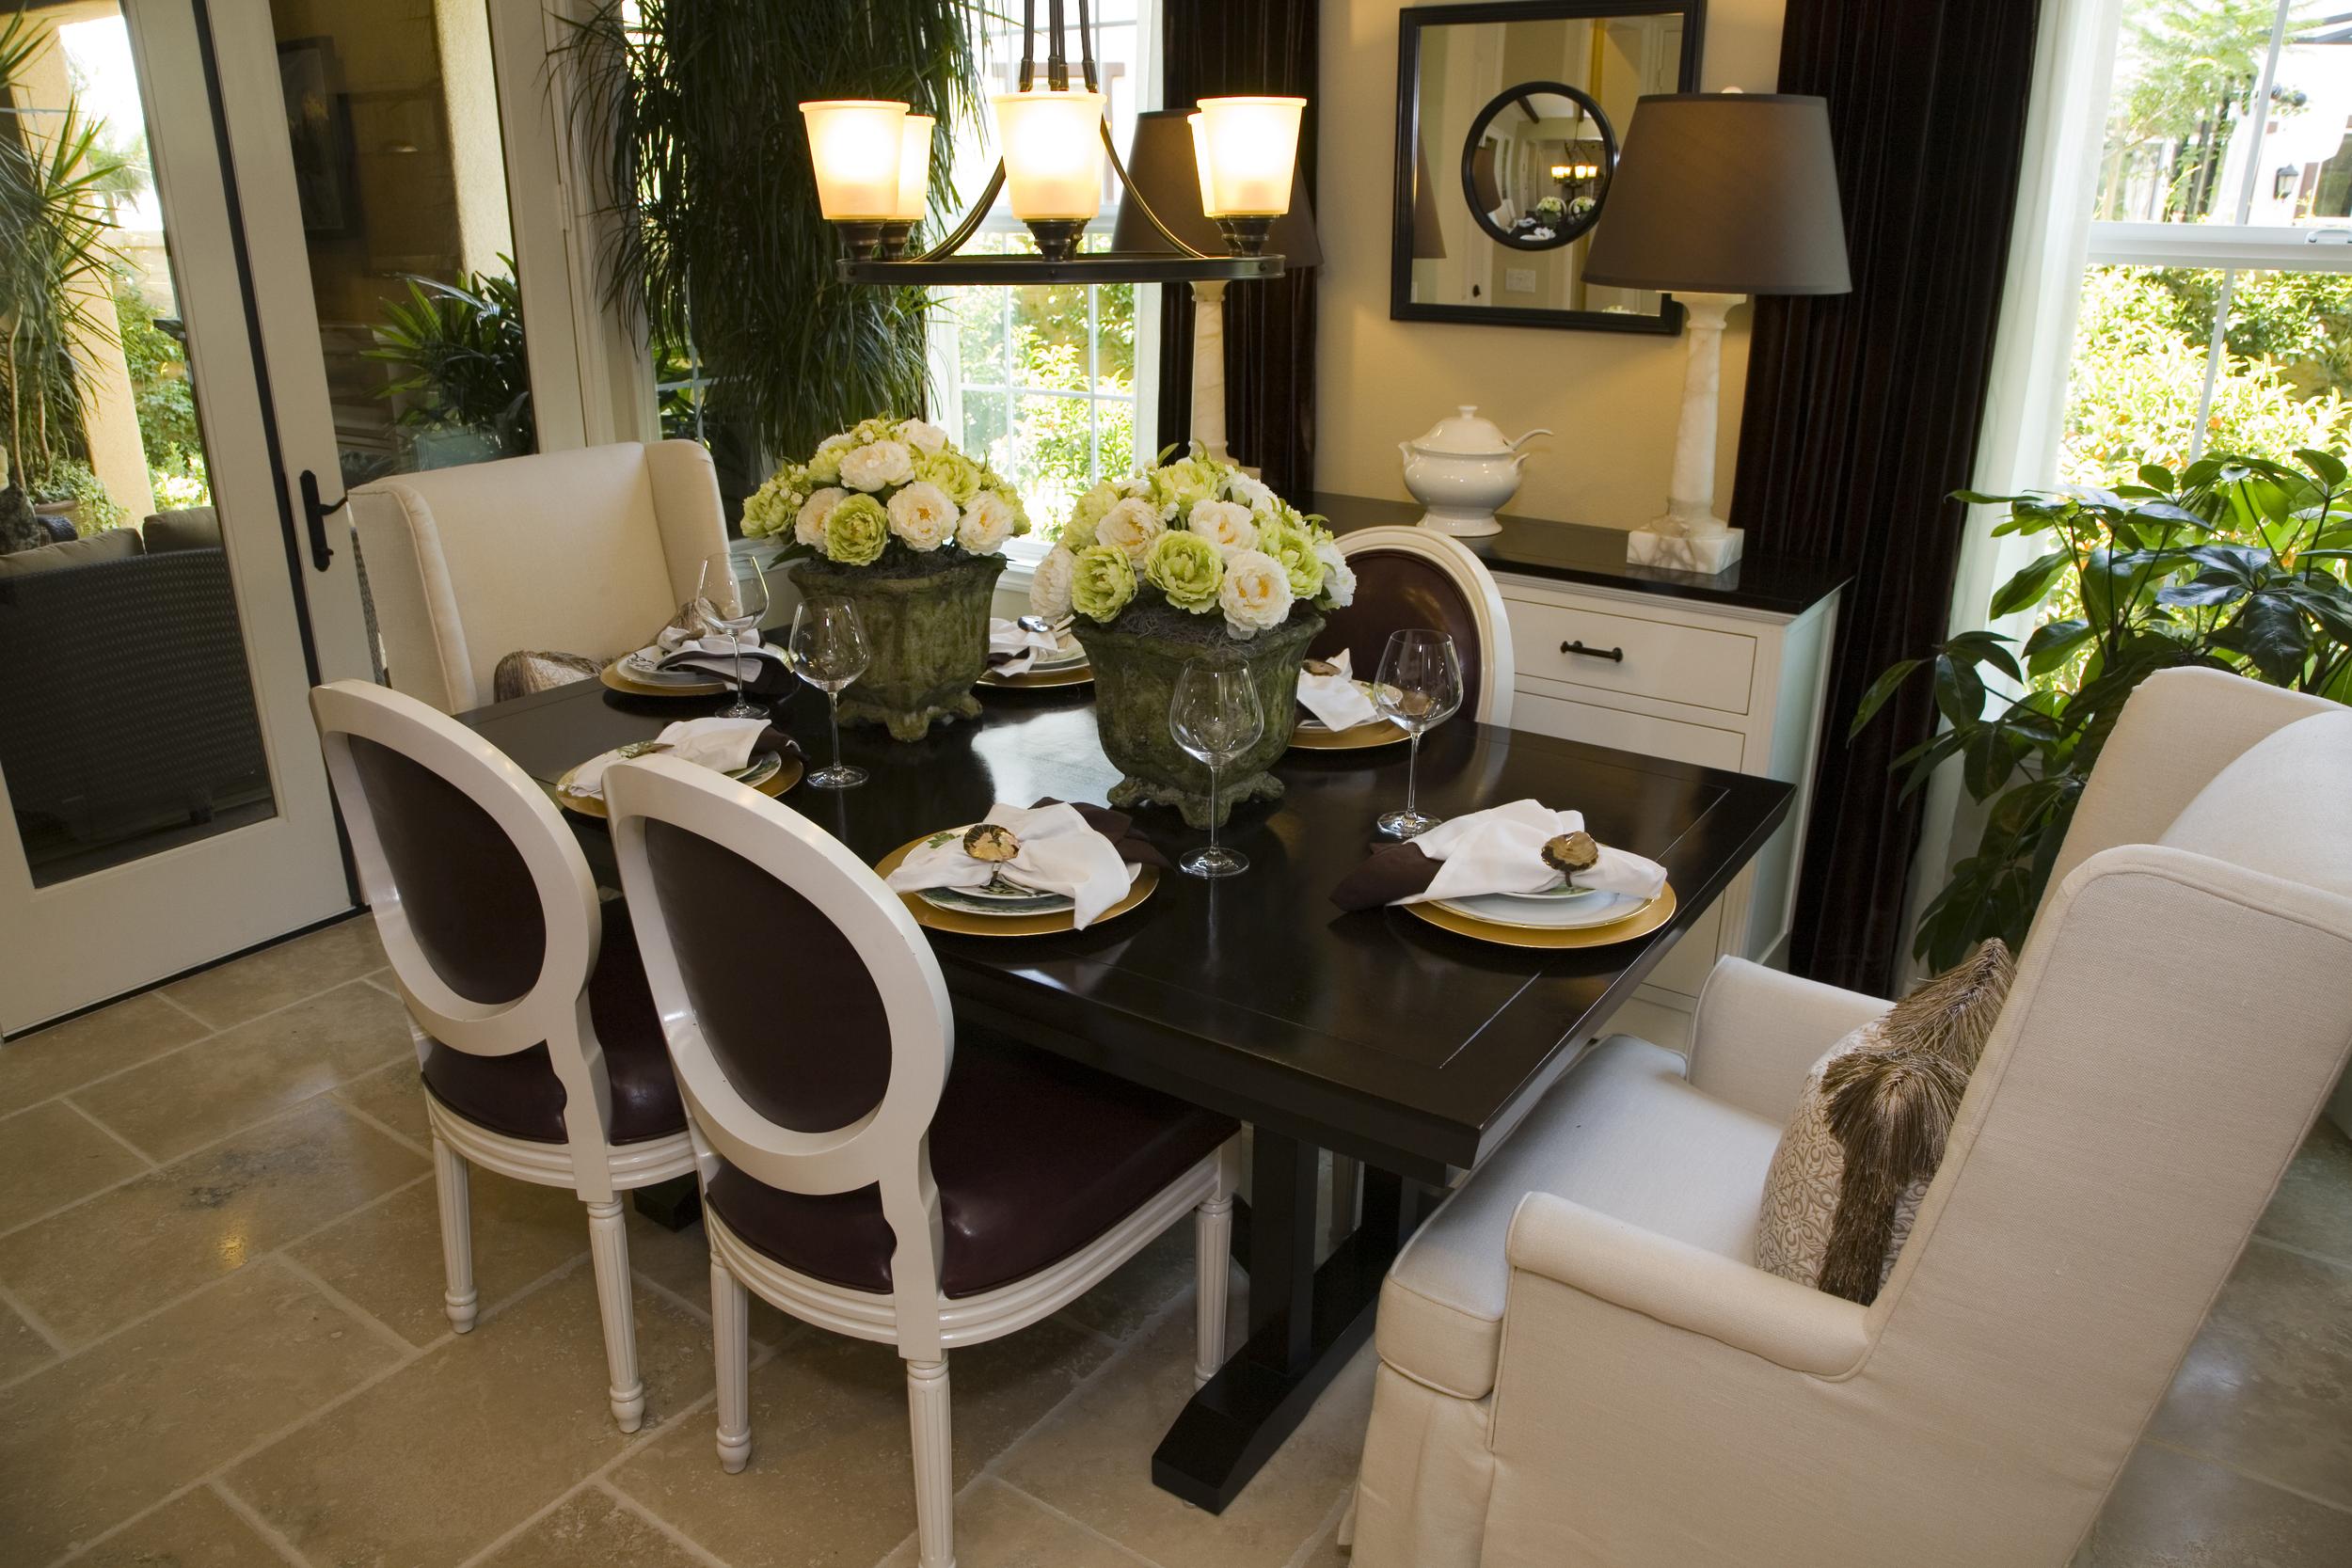 Used Furniture Appraisal PROCESS Pricing Diningroom